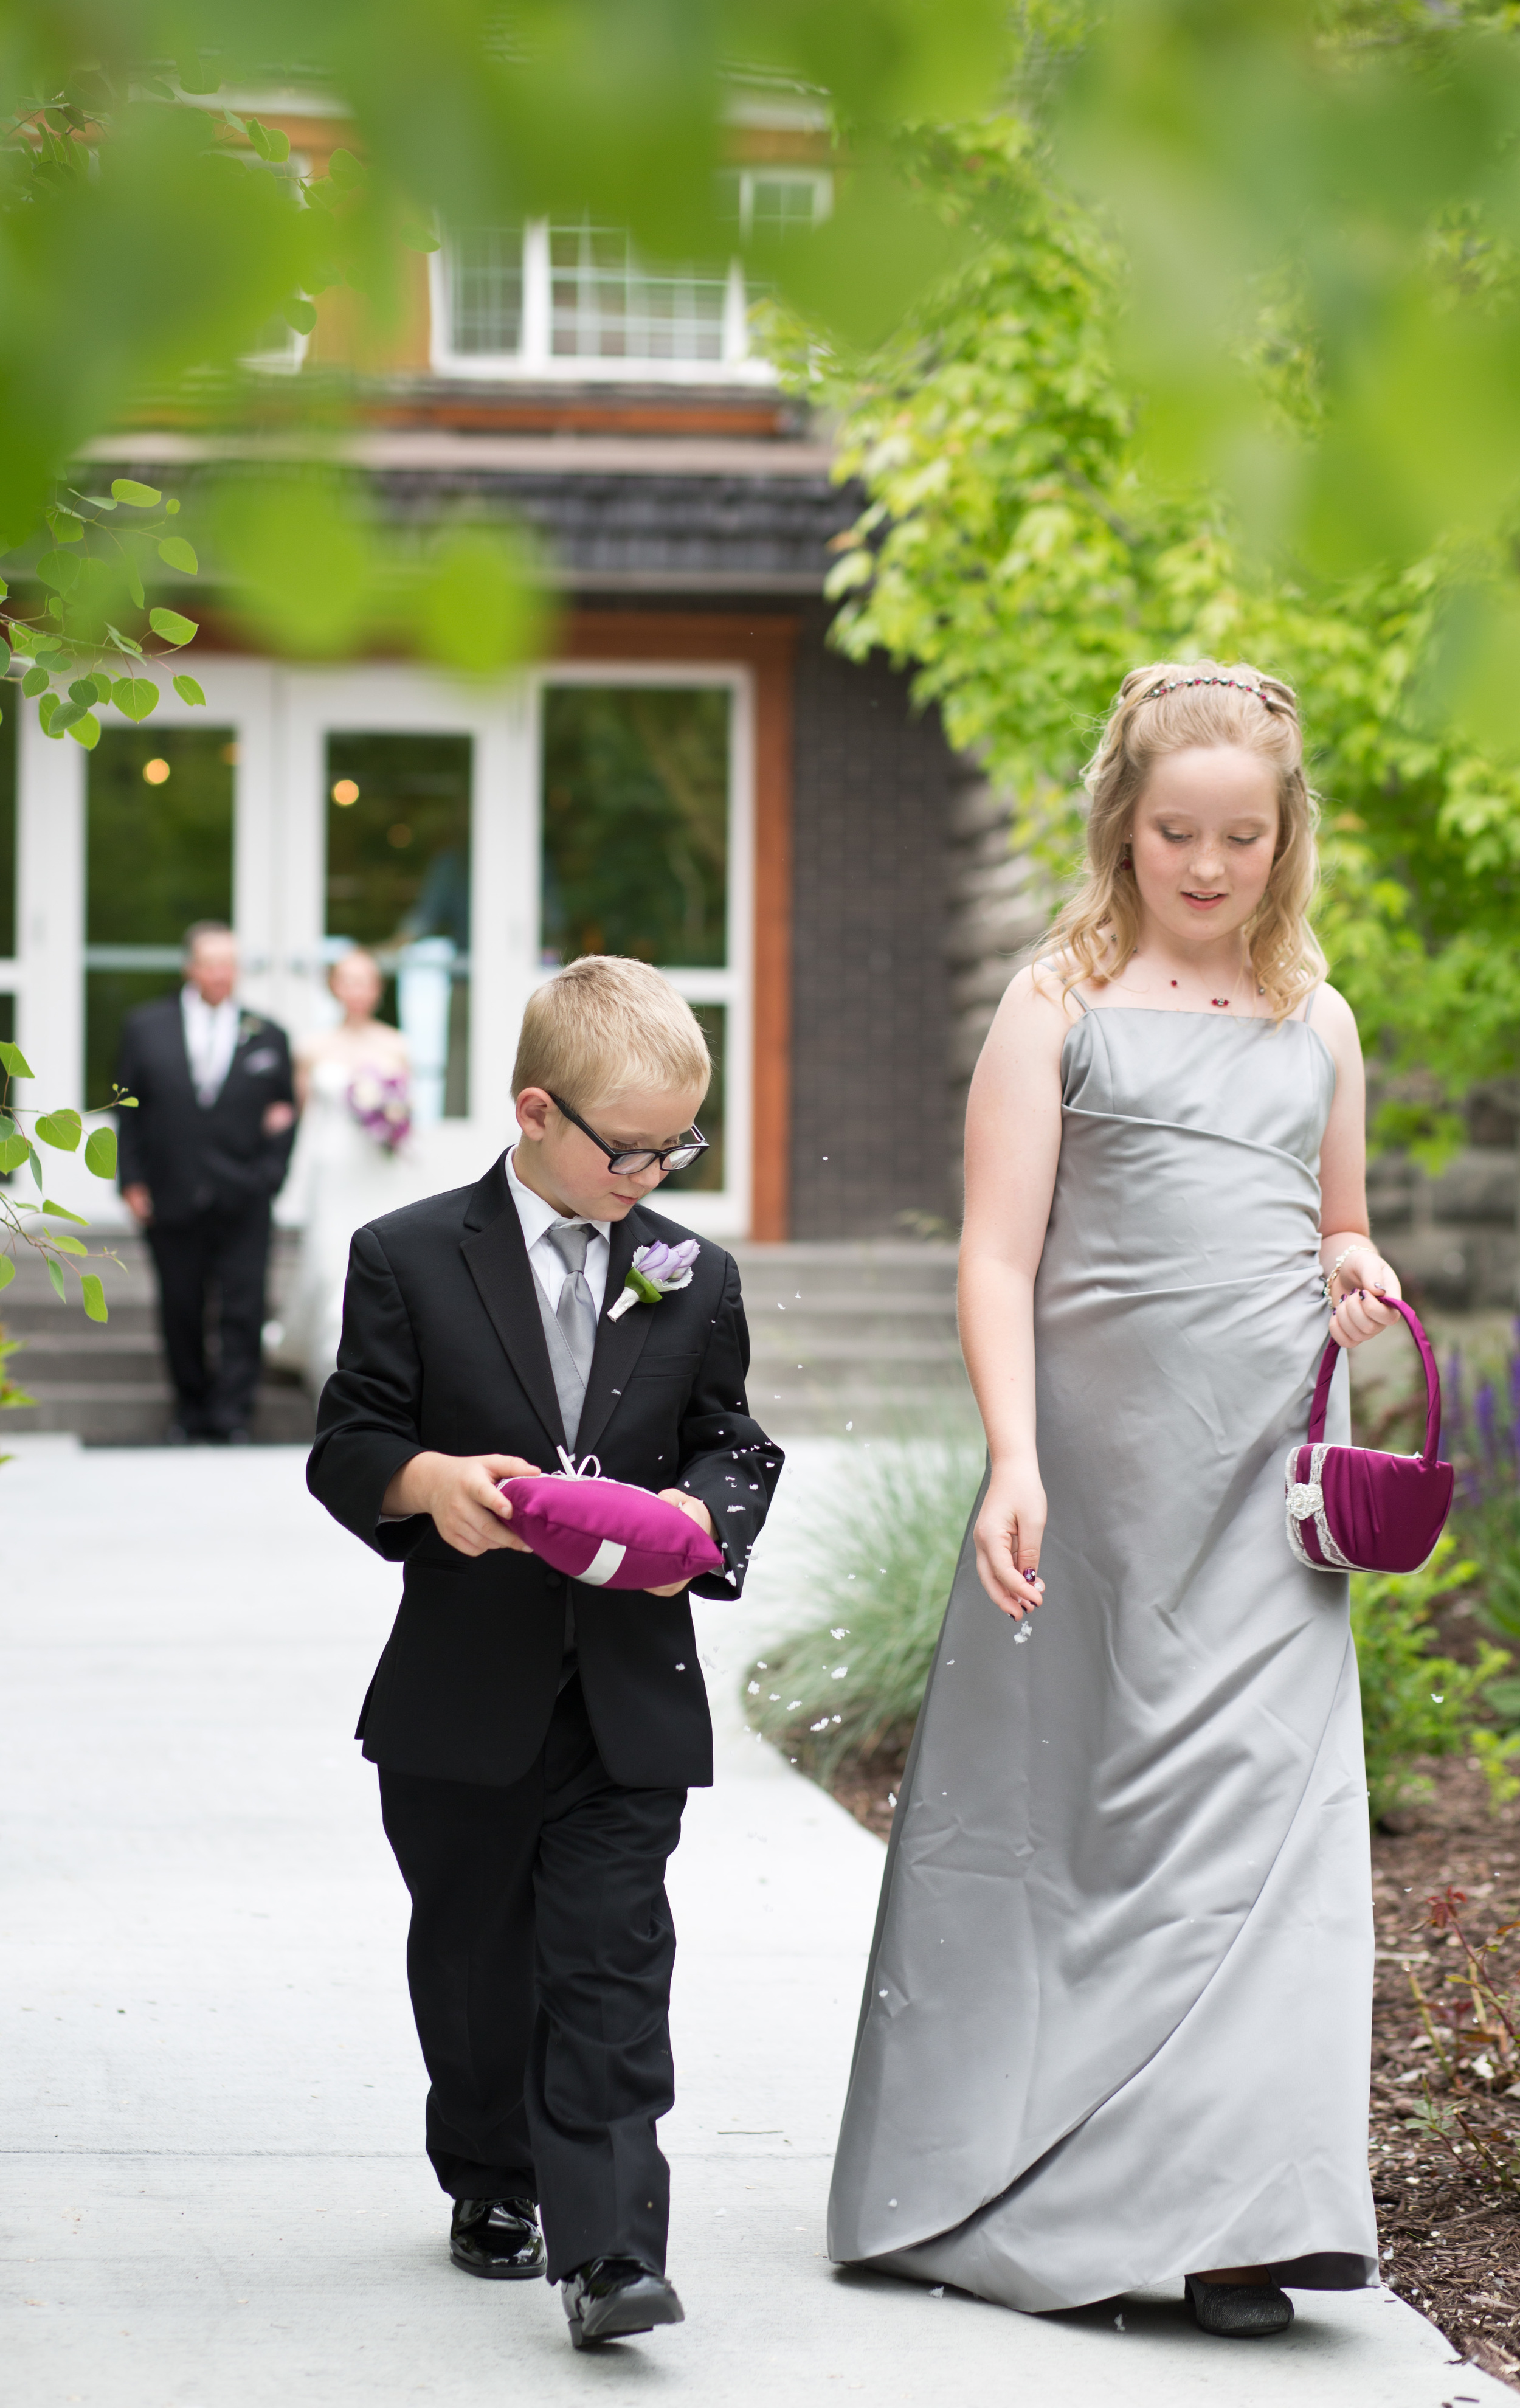 OVERTON WEDDING 1.JPG